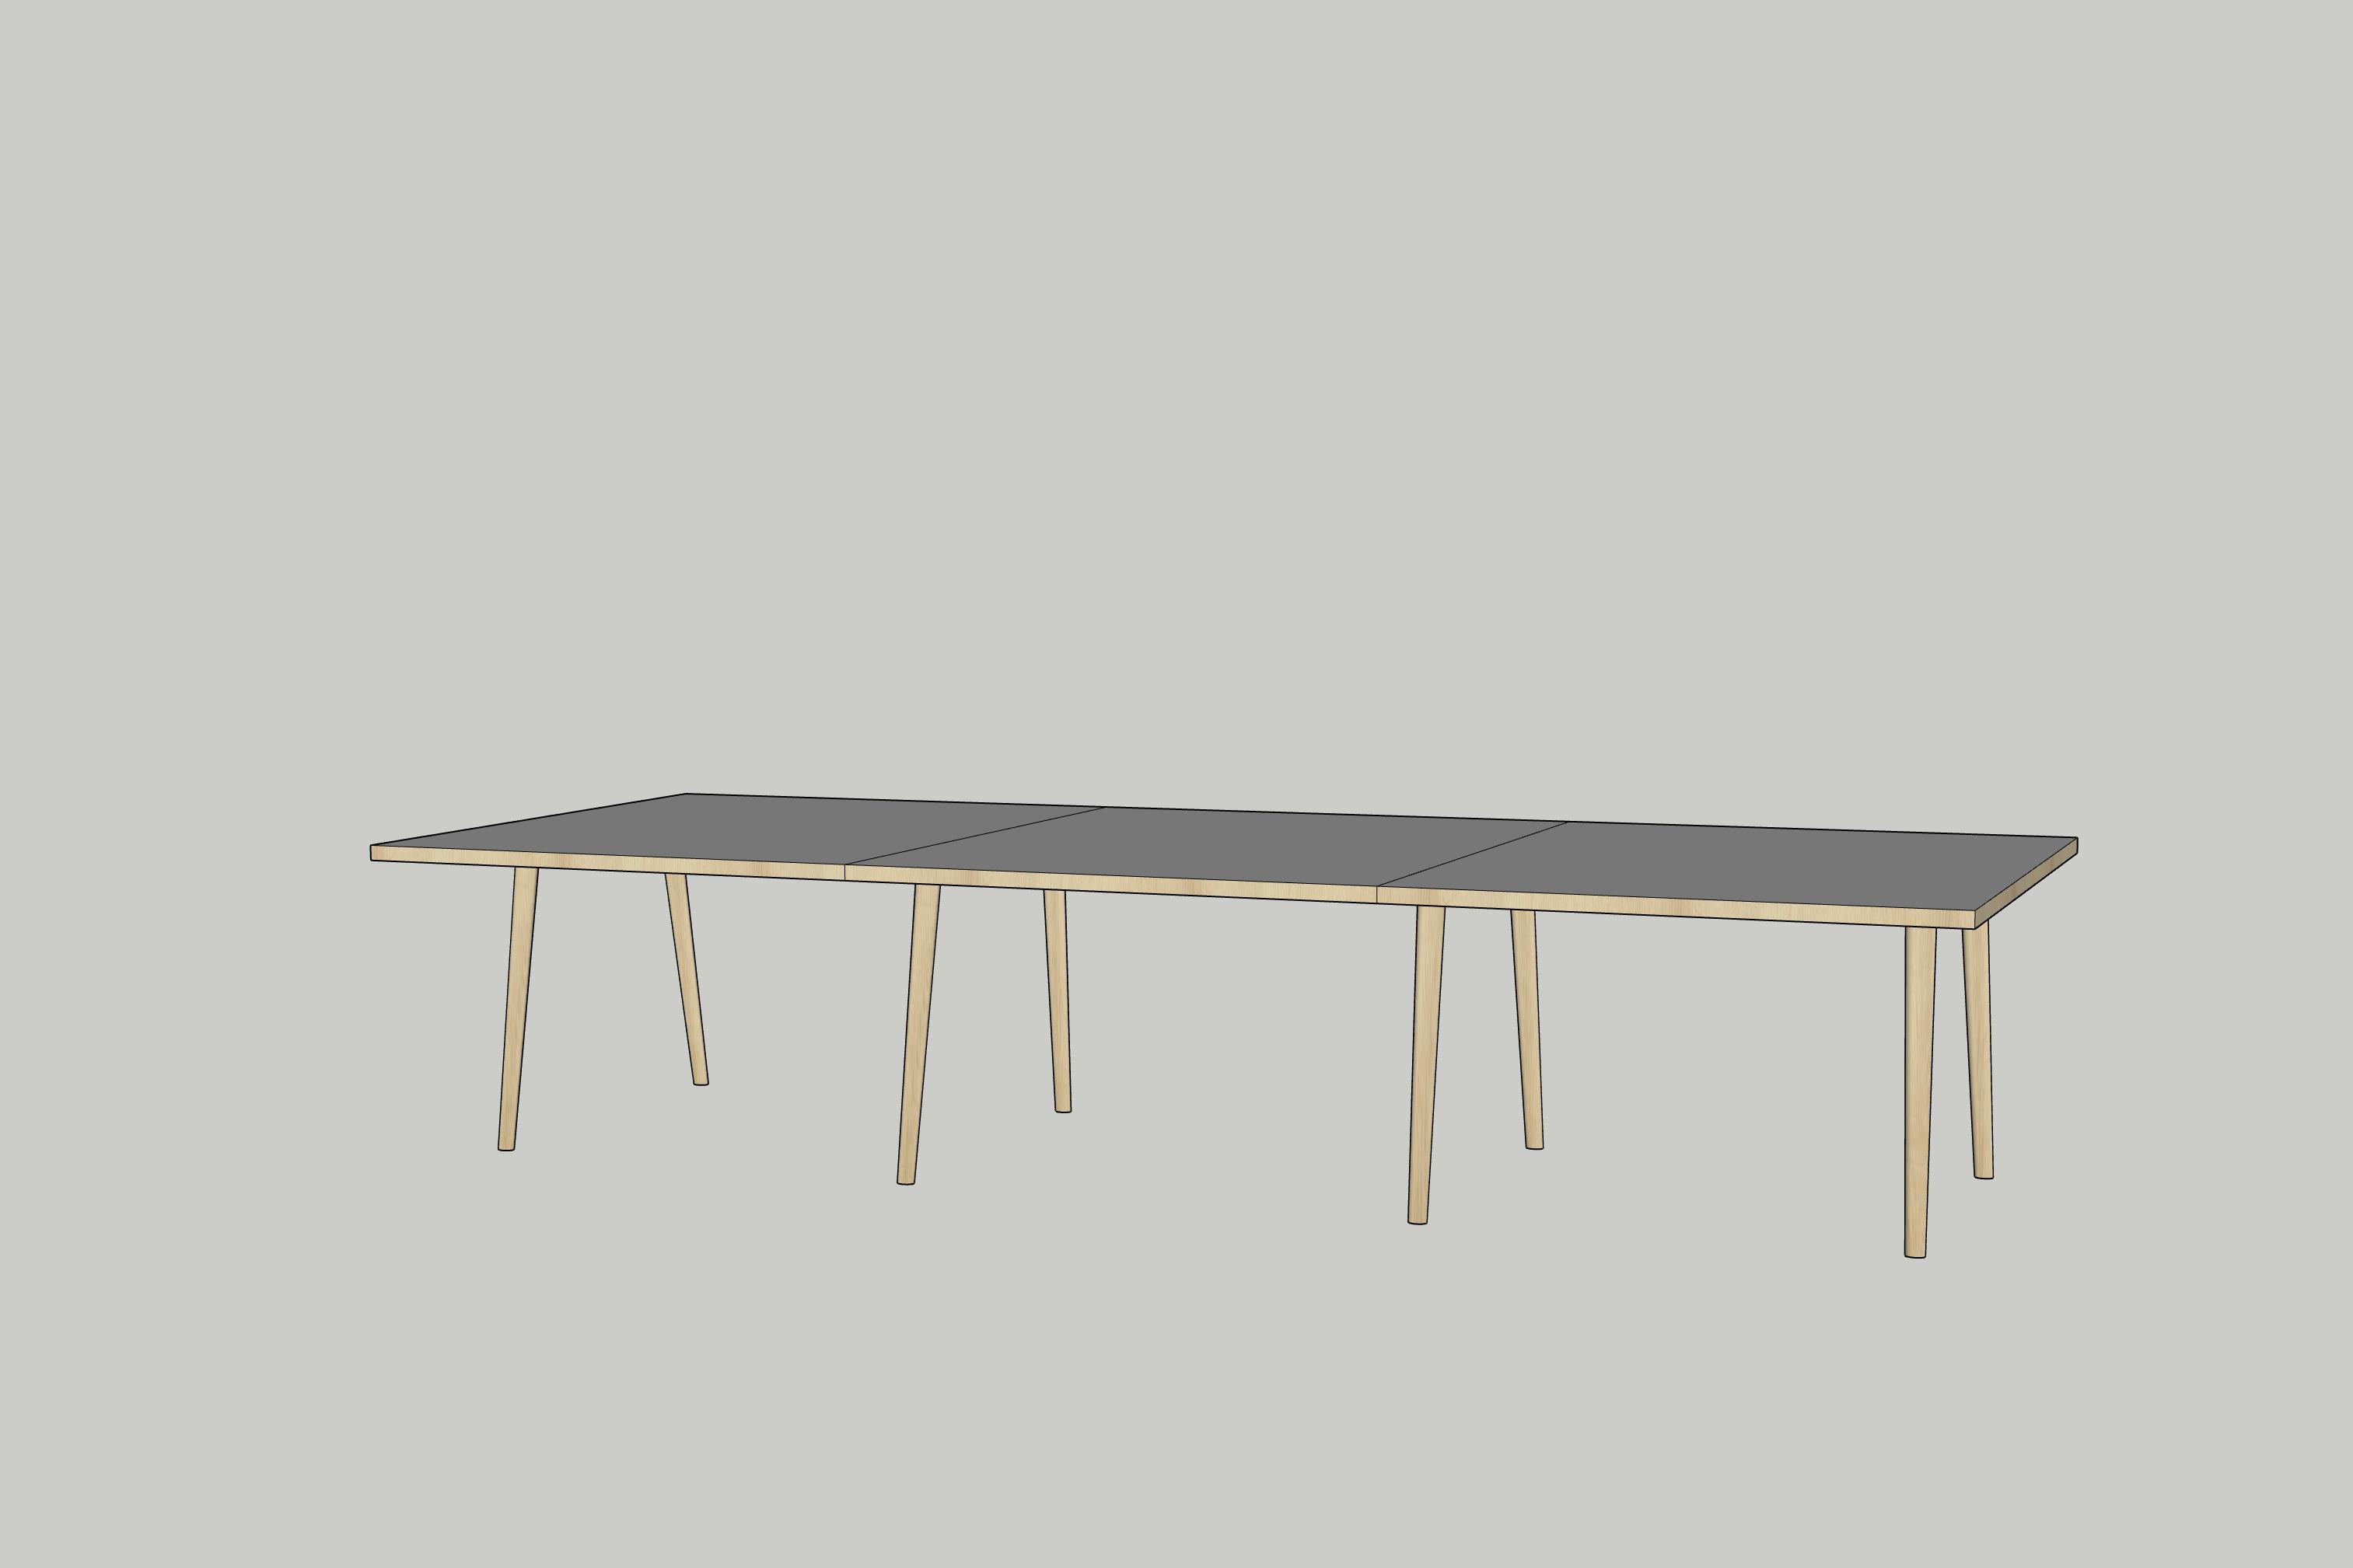 SketchUp table model